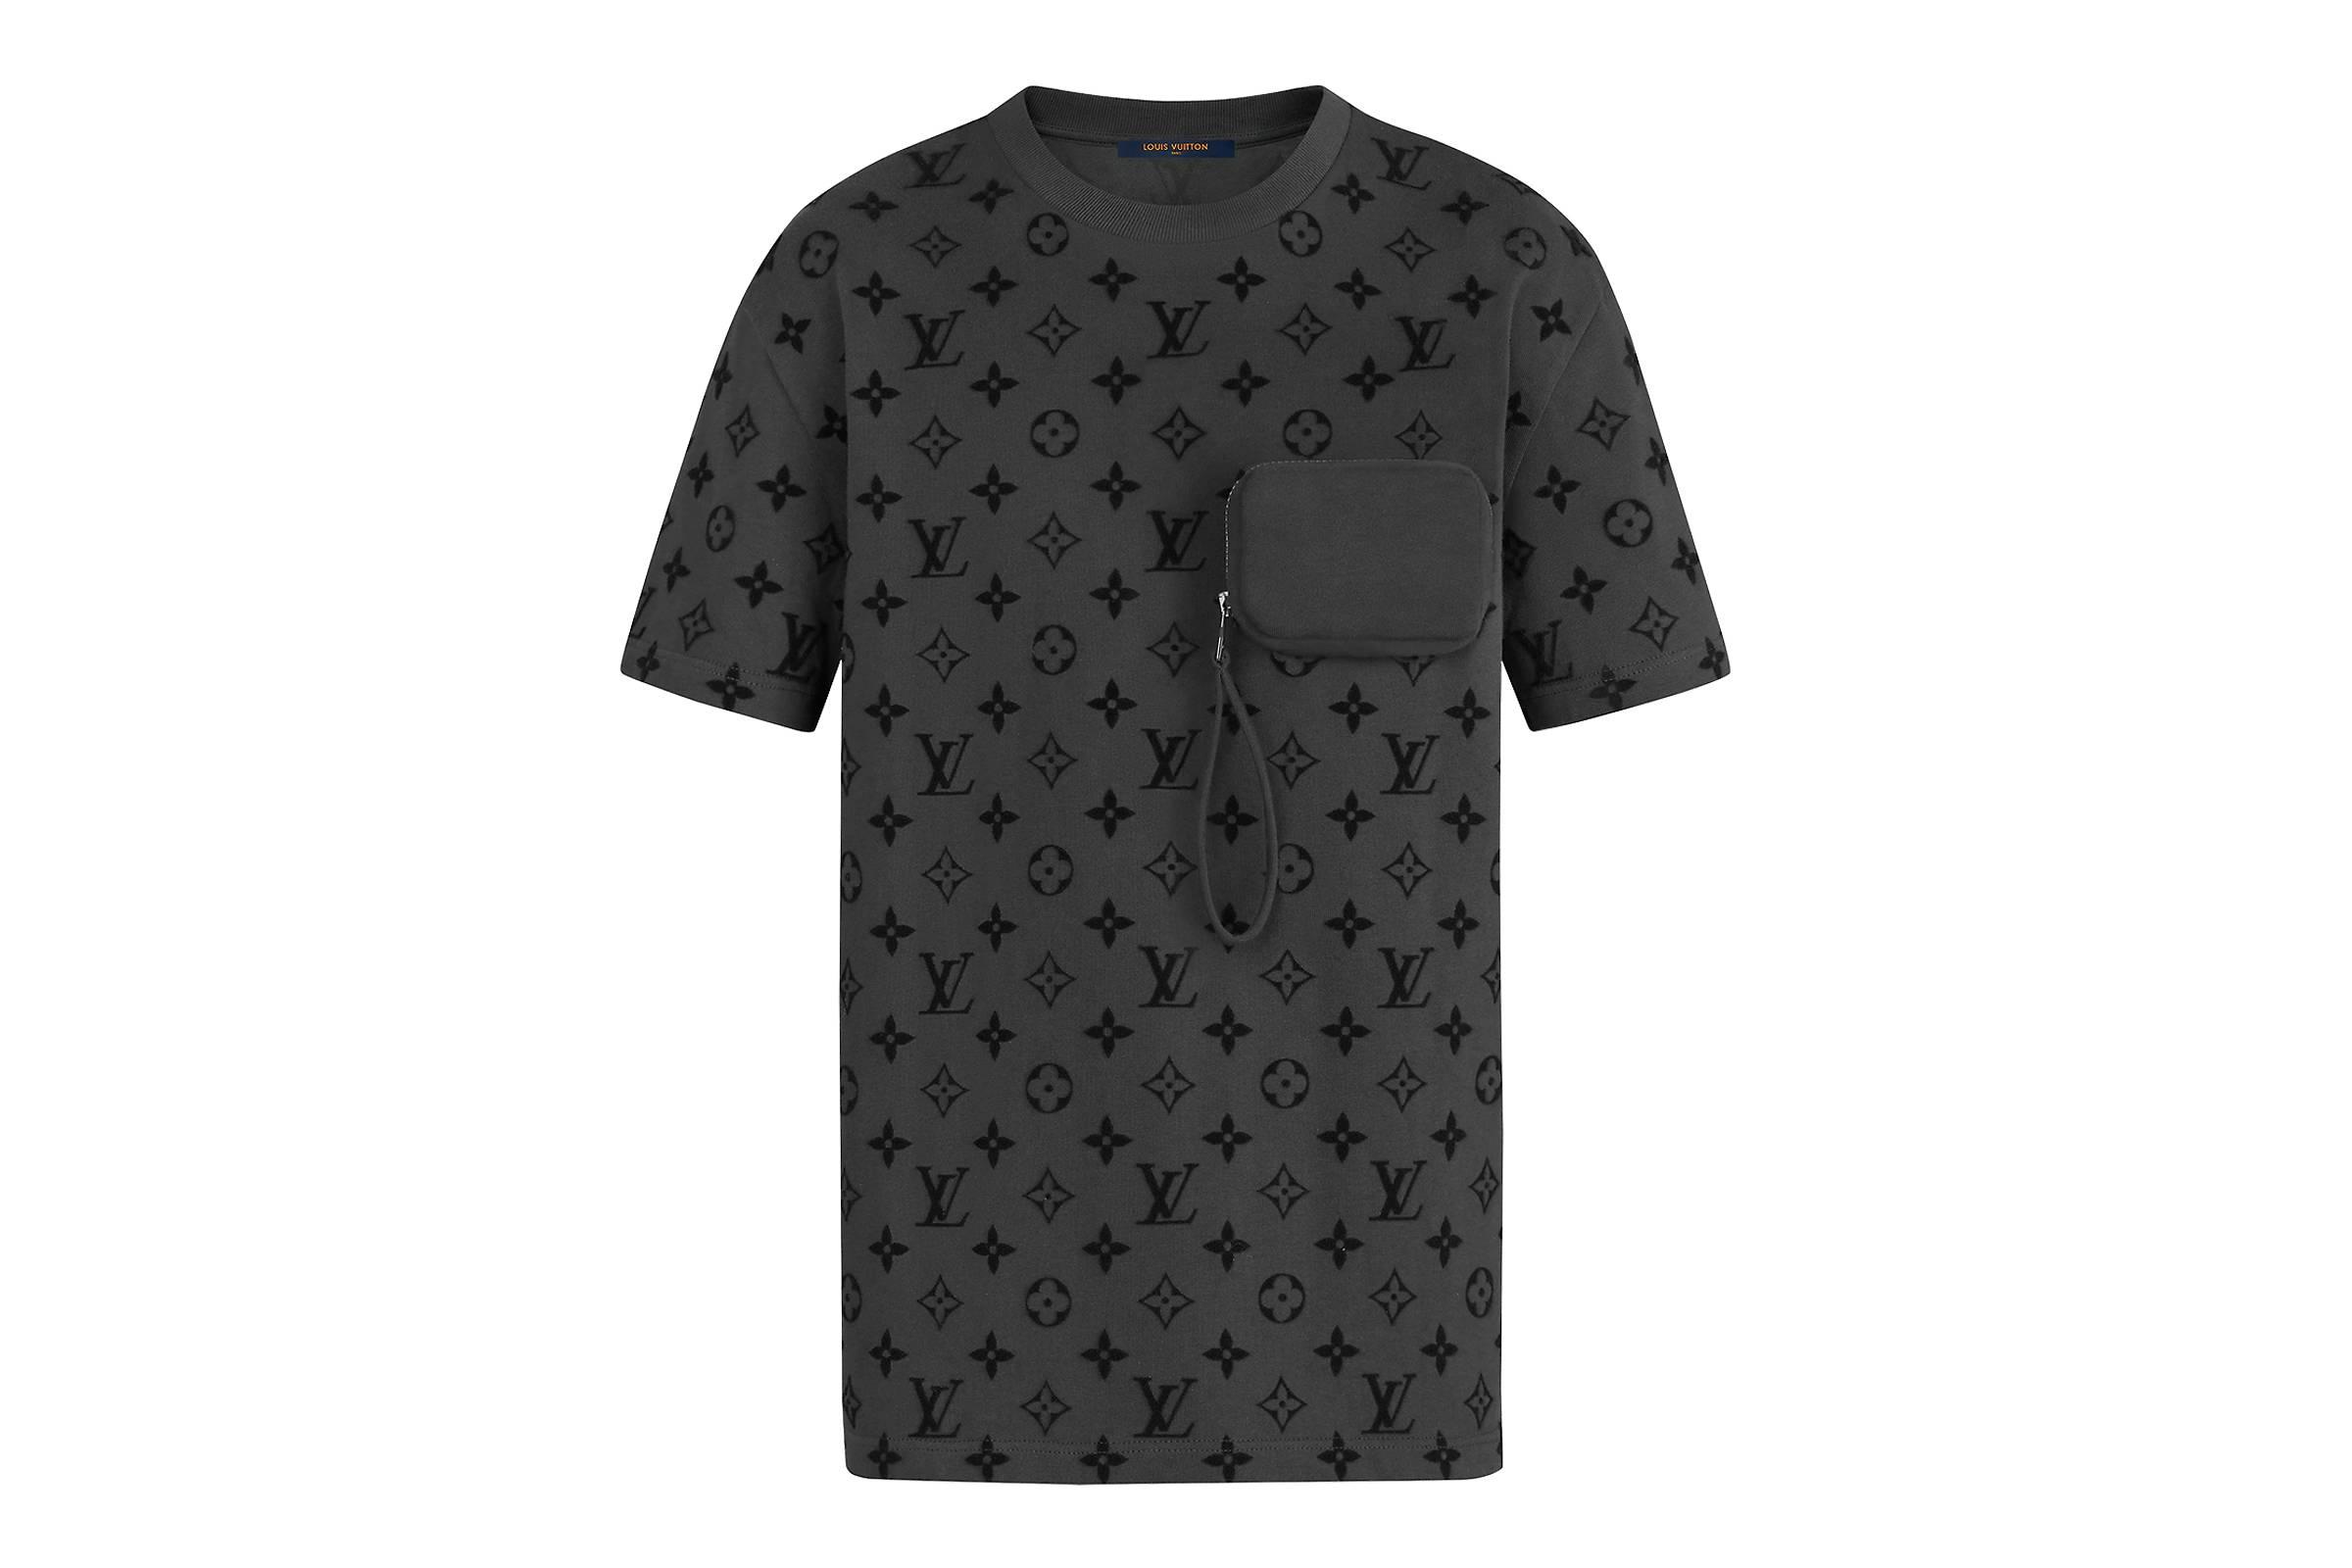 Louis Vuitton Hook and Loop Monogram T-Shirt